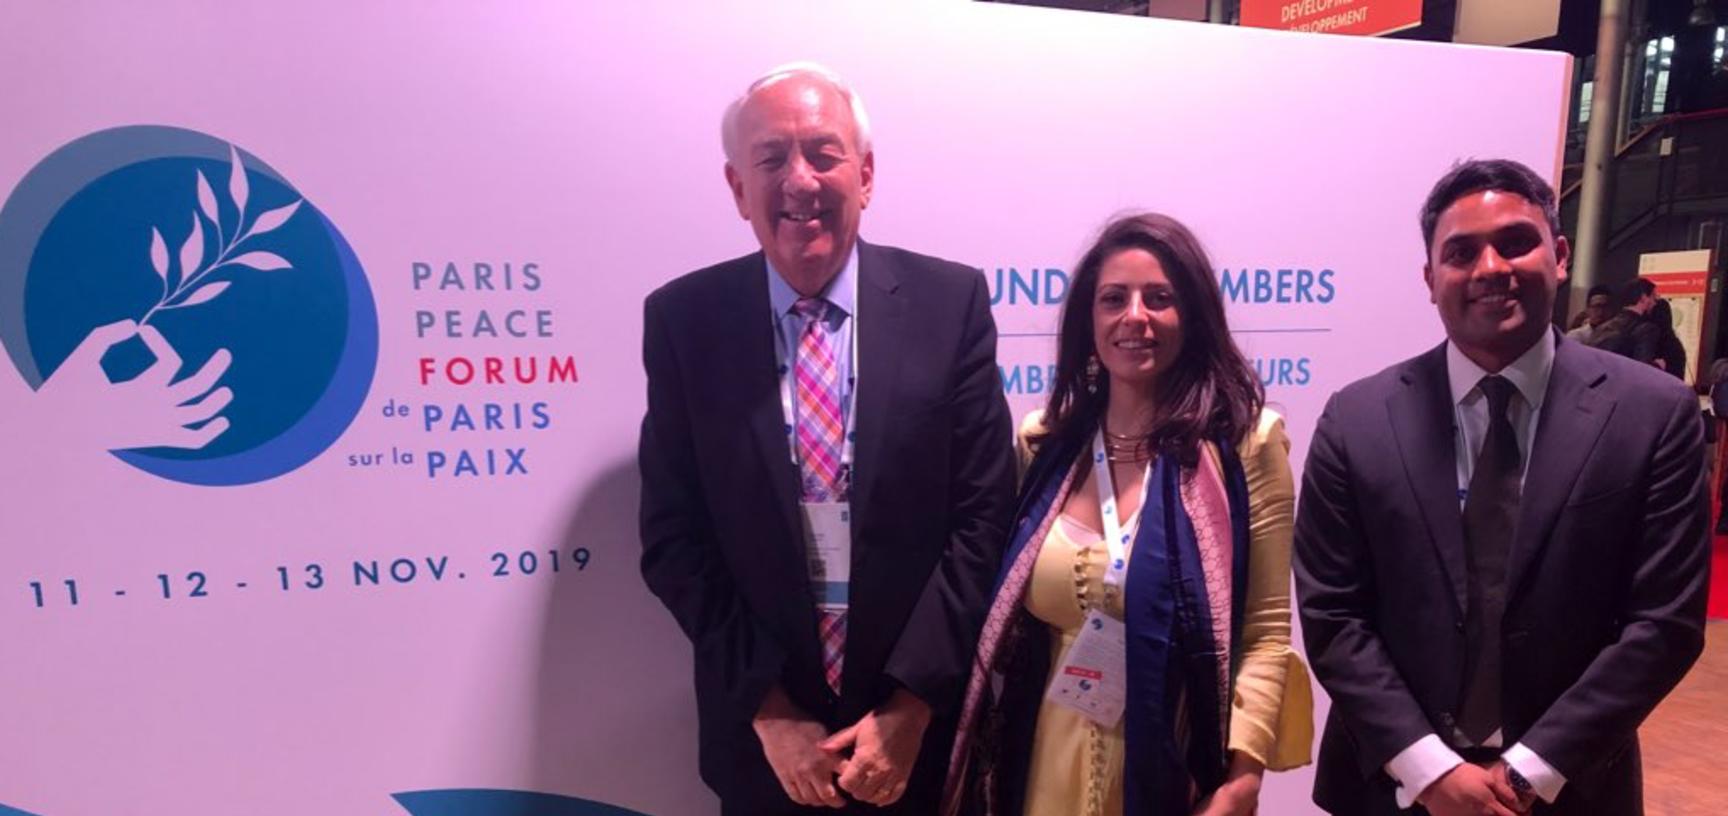 Stephen Rapp, Ryan D'Souza and Federica D'Alessandra at the Paris Peace Forum 2019